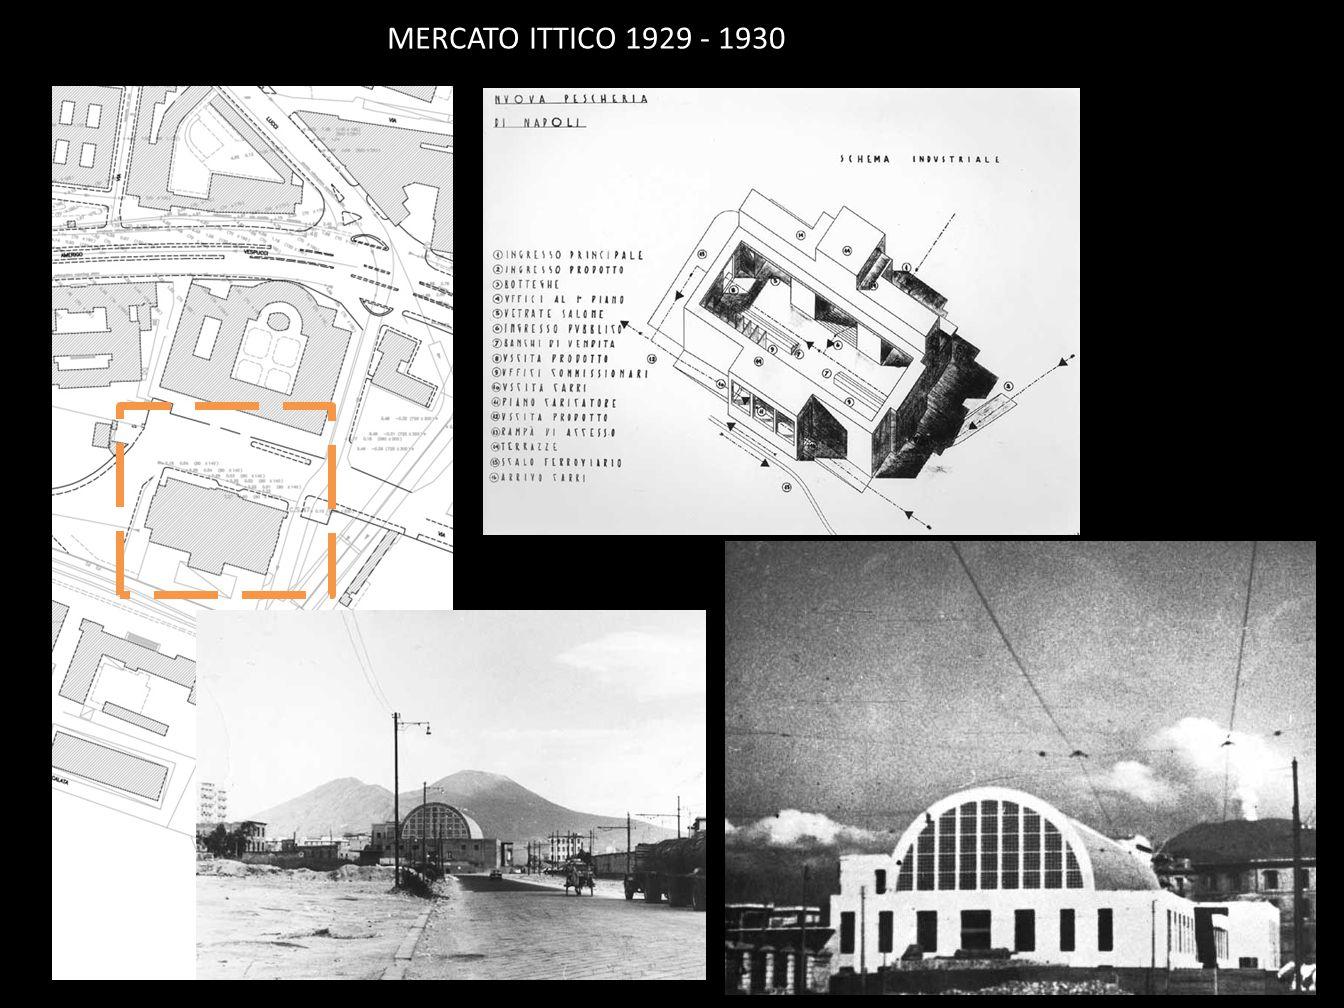 MERCATO ITTICO 1929 - 1930